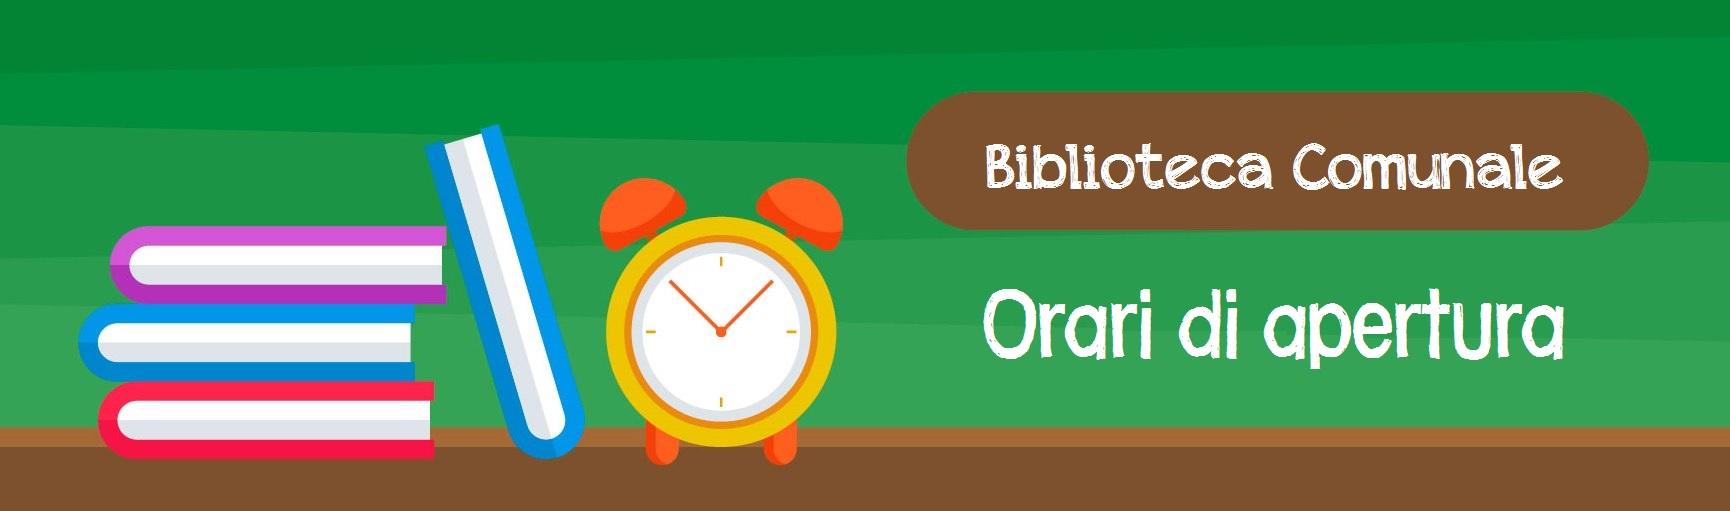 Banner Orario biblioteca